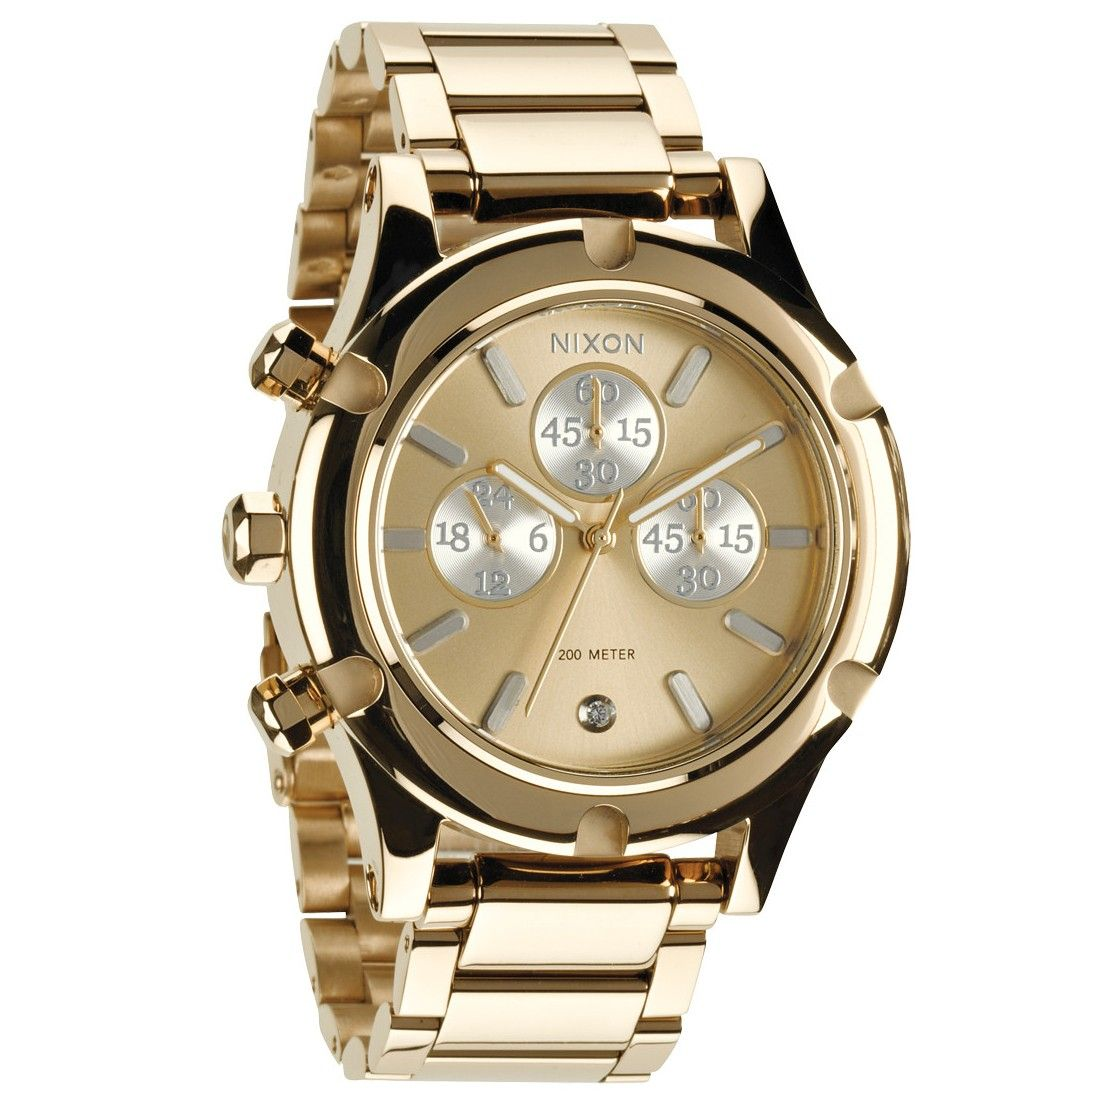 Nixon womens watch the camden chrono champagne gold silver watch